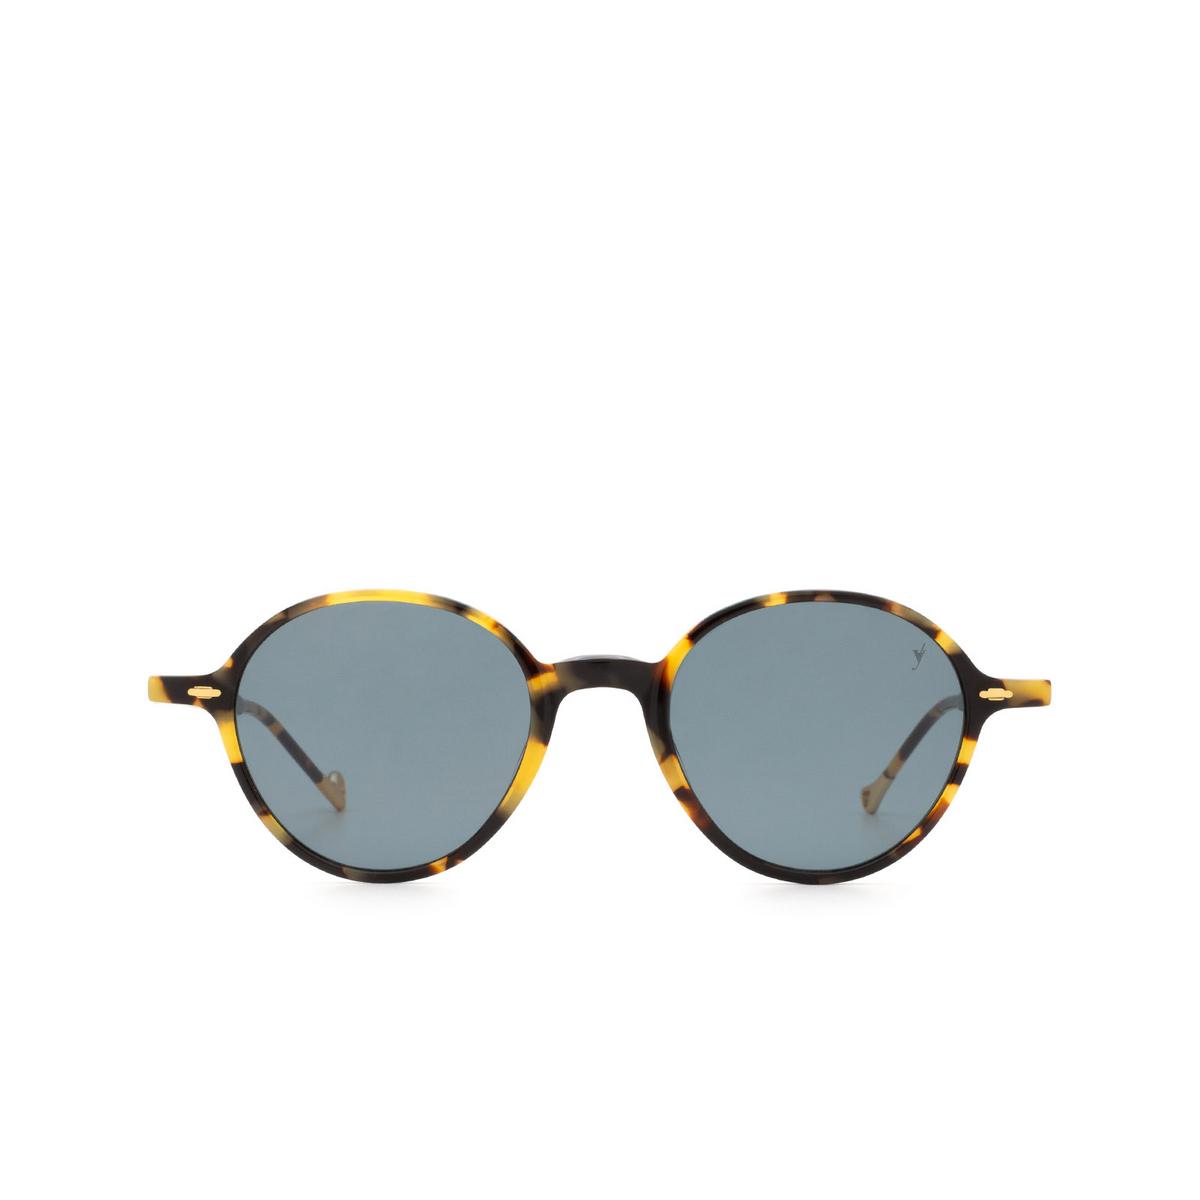 Eyepetizer® Round Sunglasses: Sforza color Havana C.F-40.